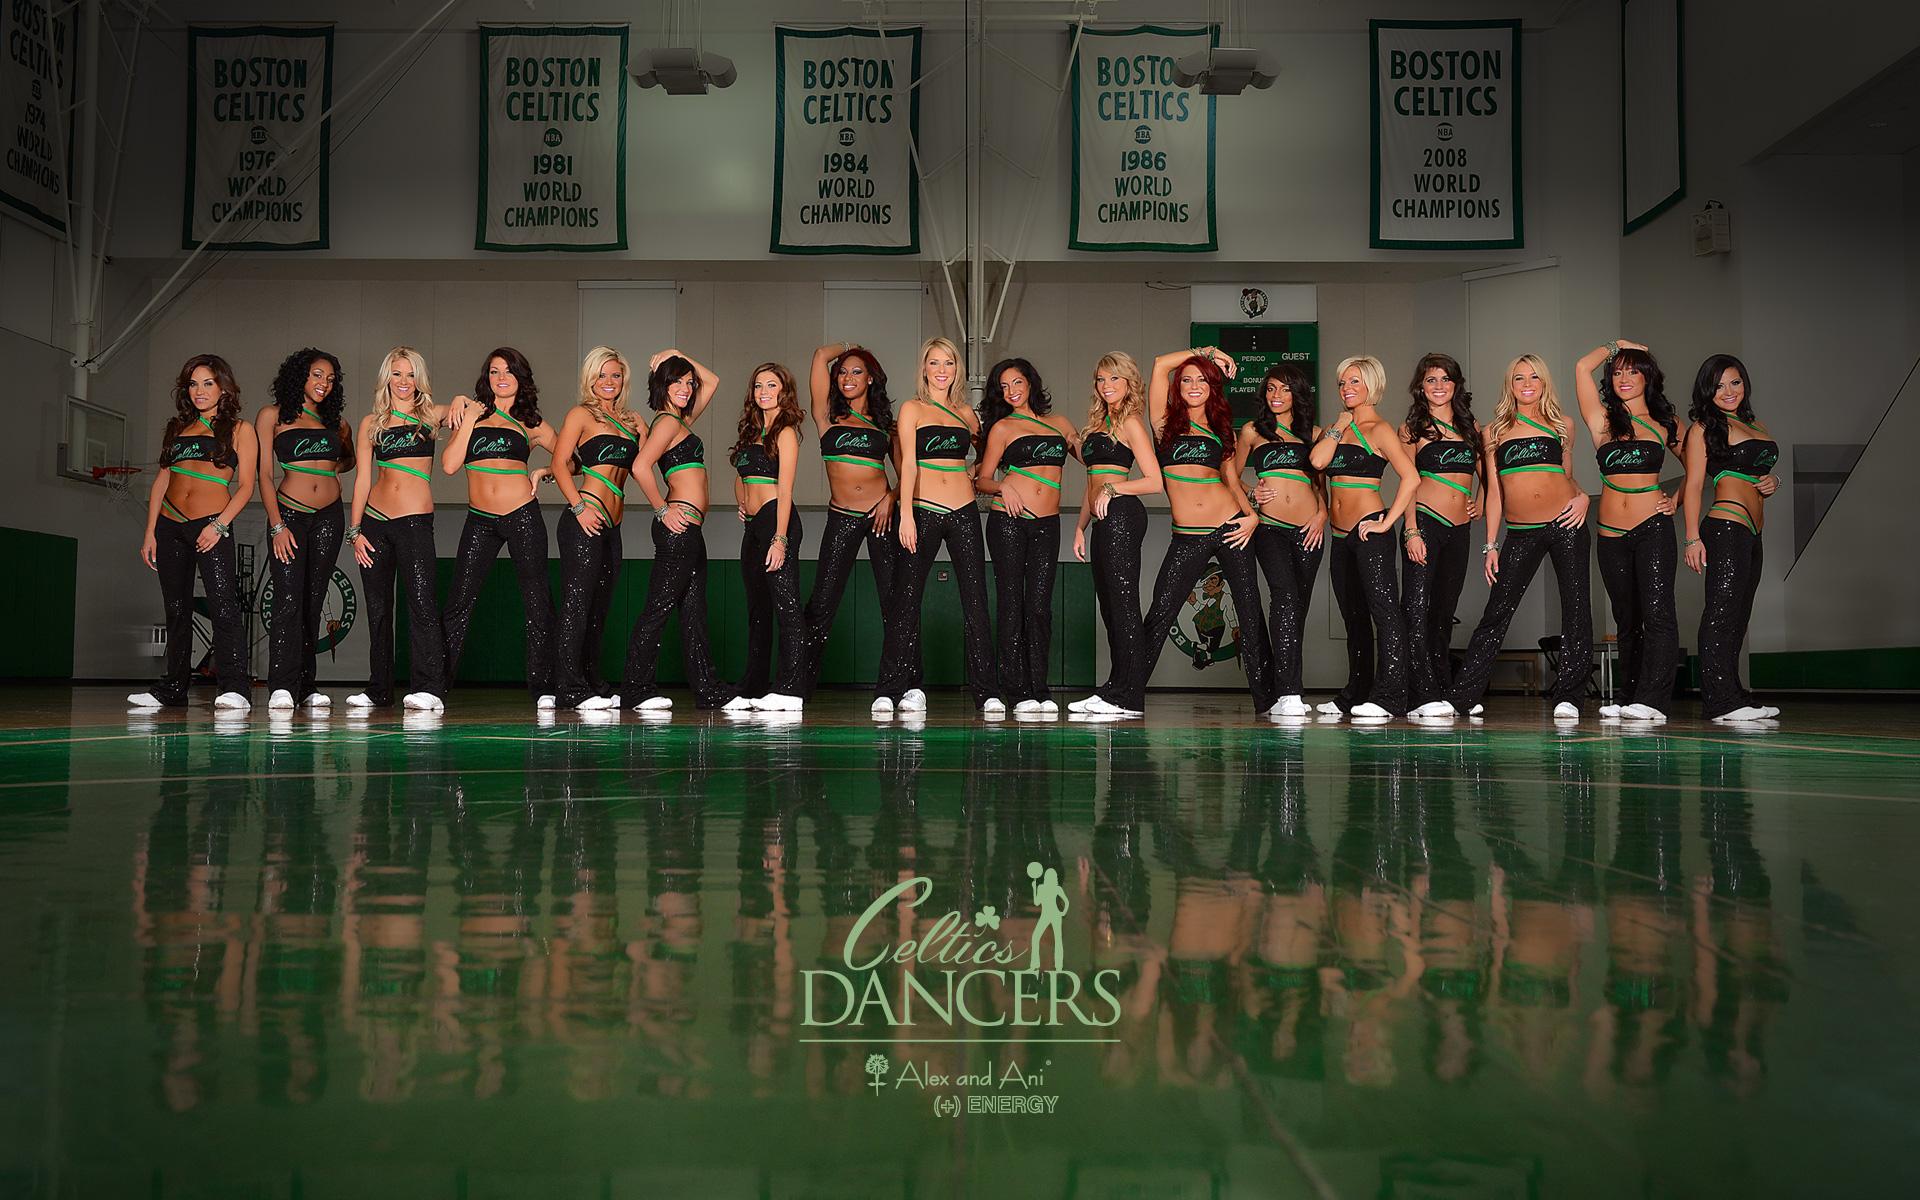 Nba Celtics , HD Wallpaper & Backgrounds